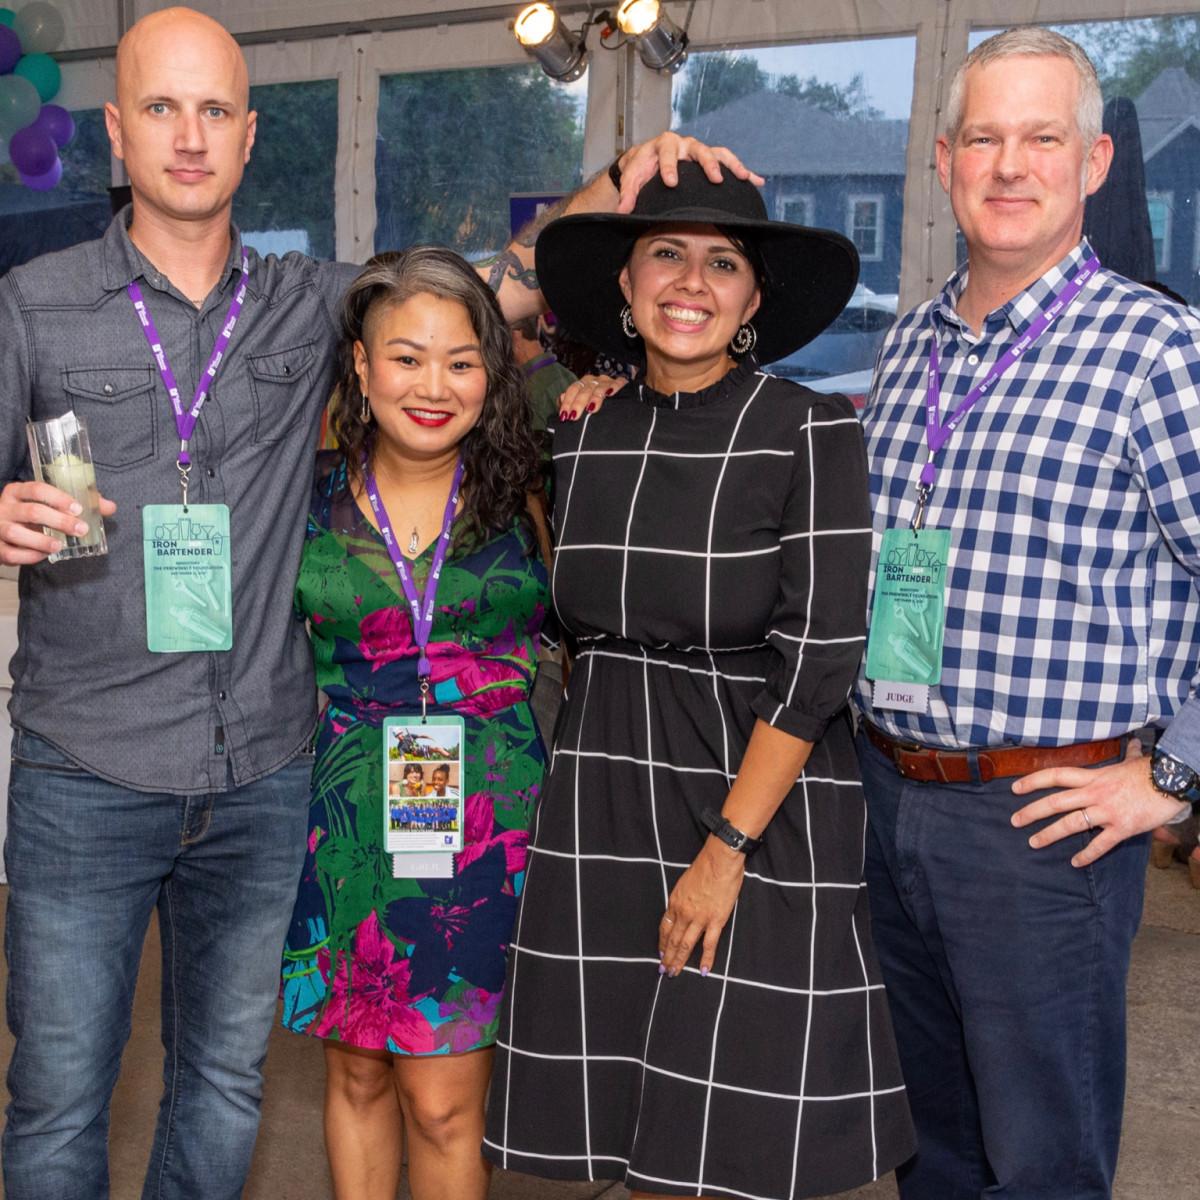 Iron Bartender Todd Leveritt, Cat Nguyen, Linda Salinas, Antonio Gianola